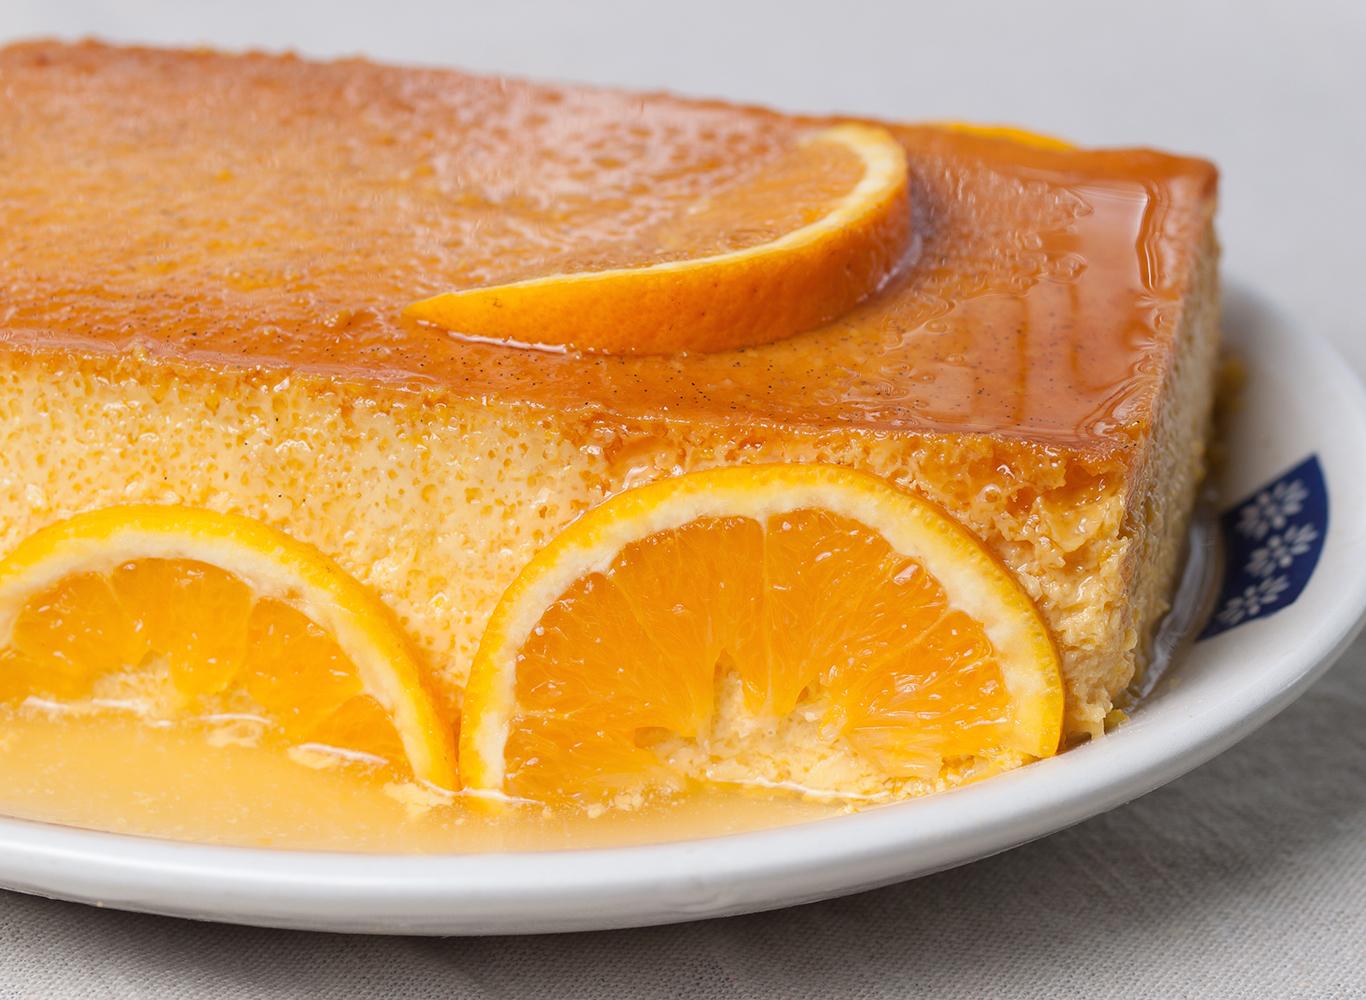 silky orange creme caramel with toffee